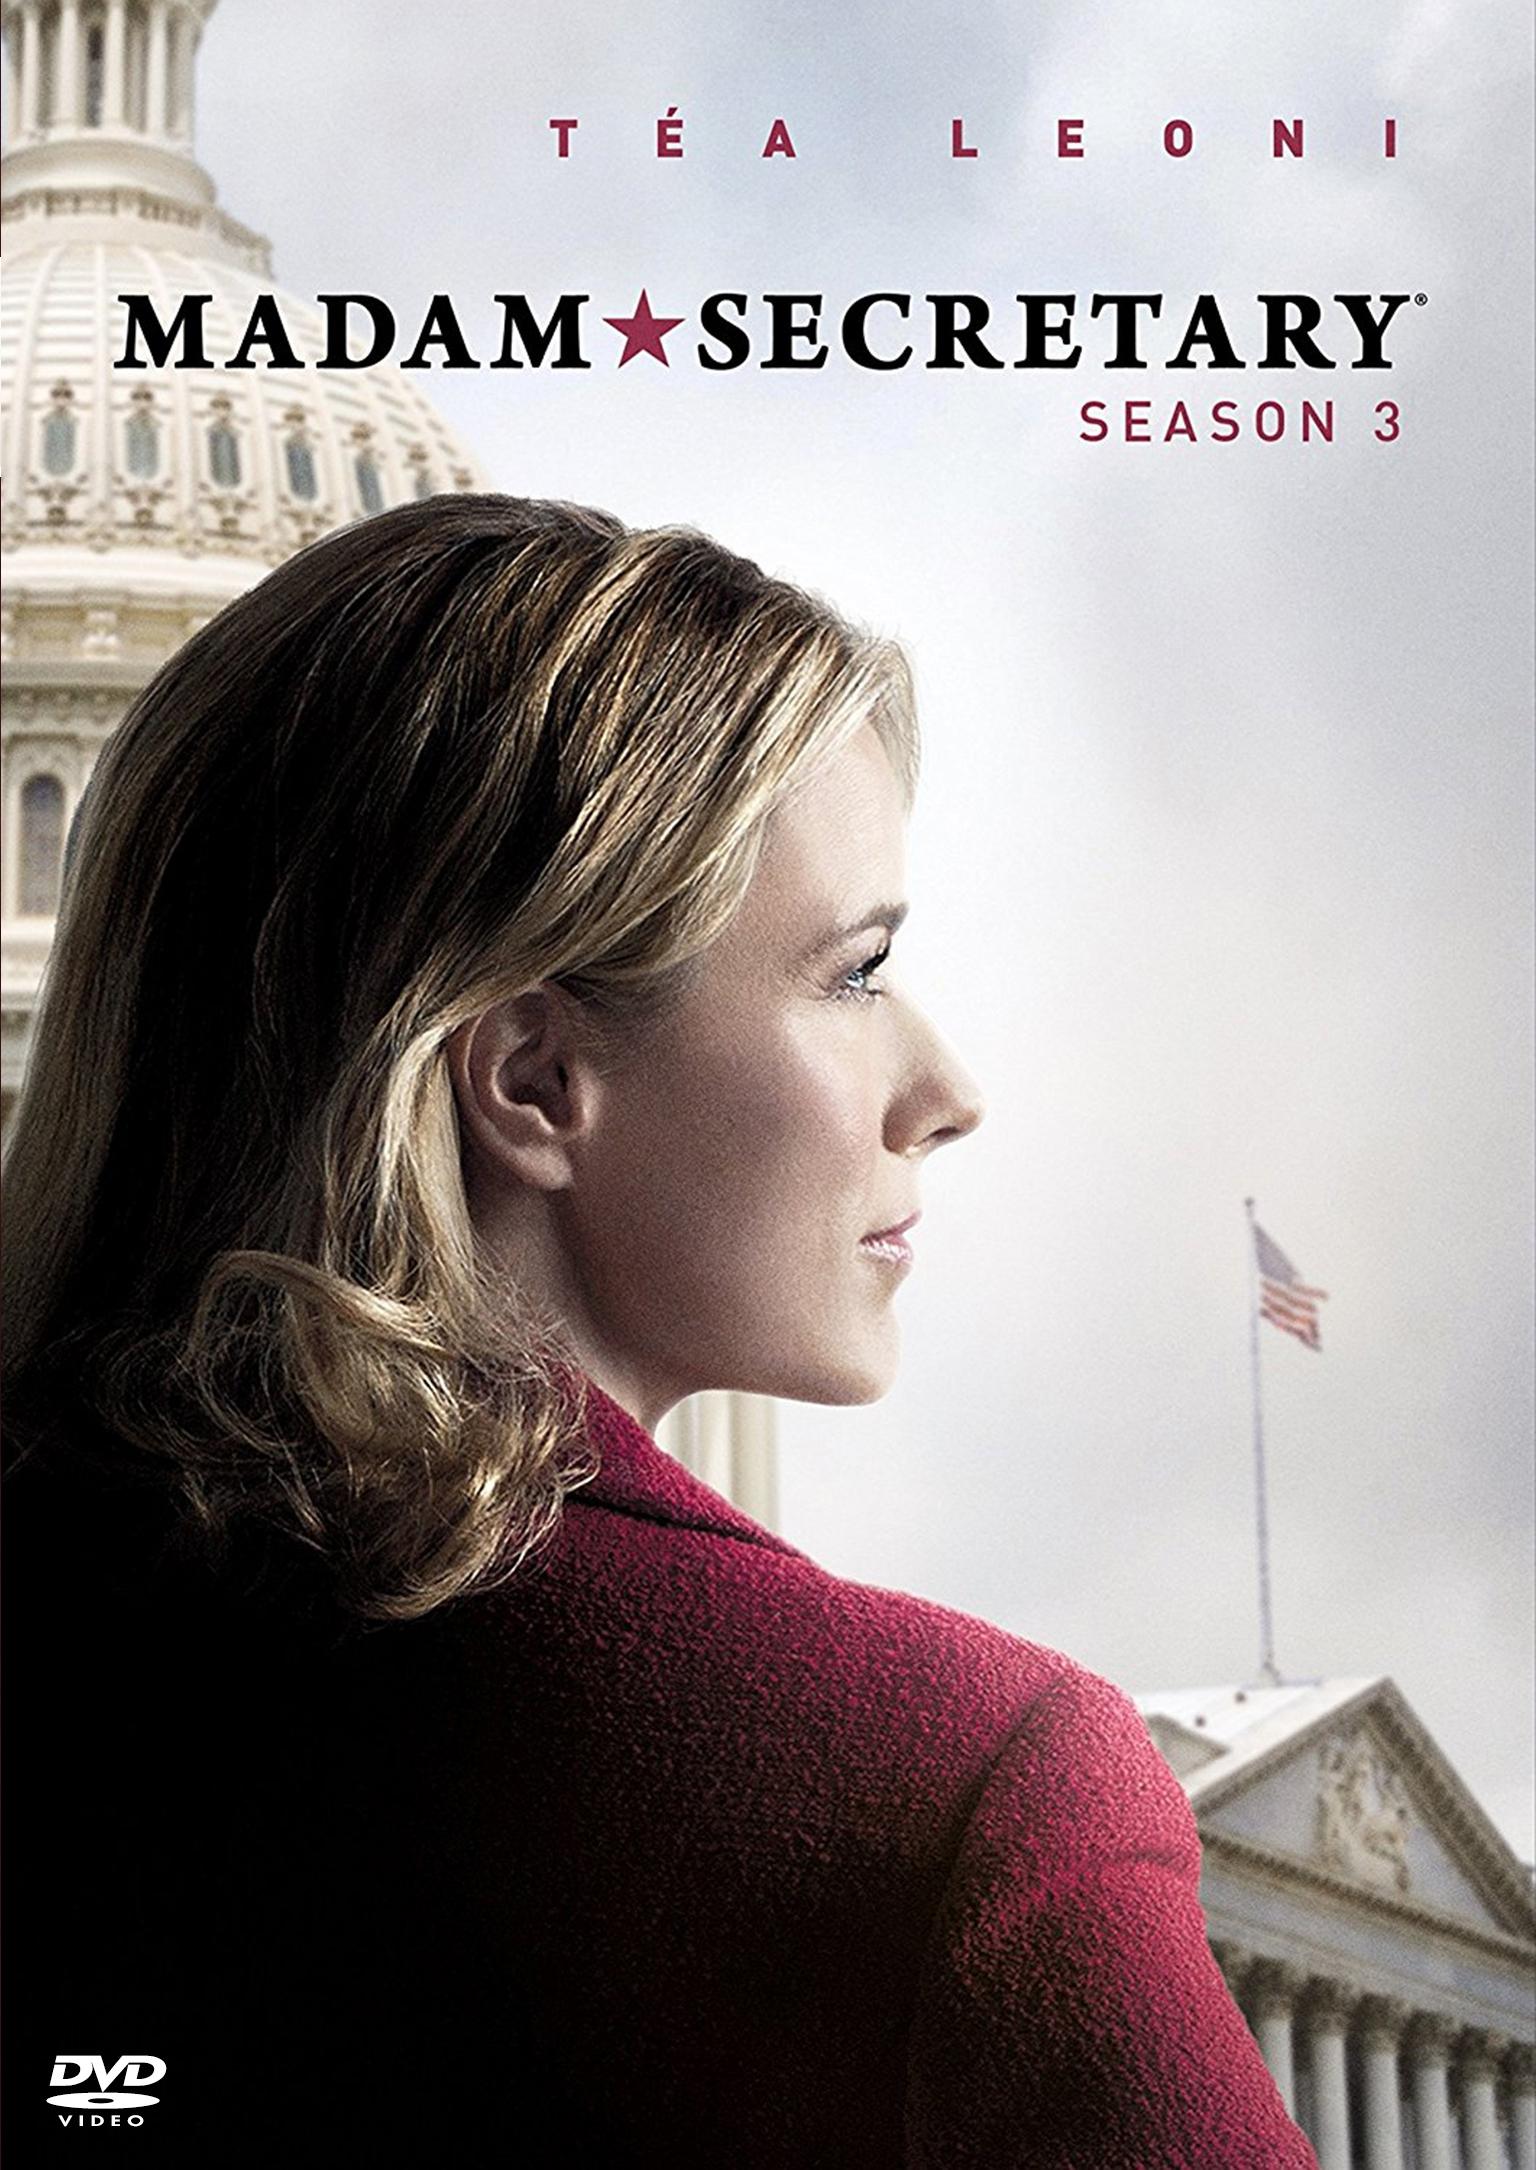 Madam Secretary Season 3 / ยอดหญิงแกร่งแห่งทำเนียบขาว ปี 3 (พากย์ไทย 4 แผ่นจบ+แถมปกฟรี)